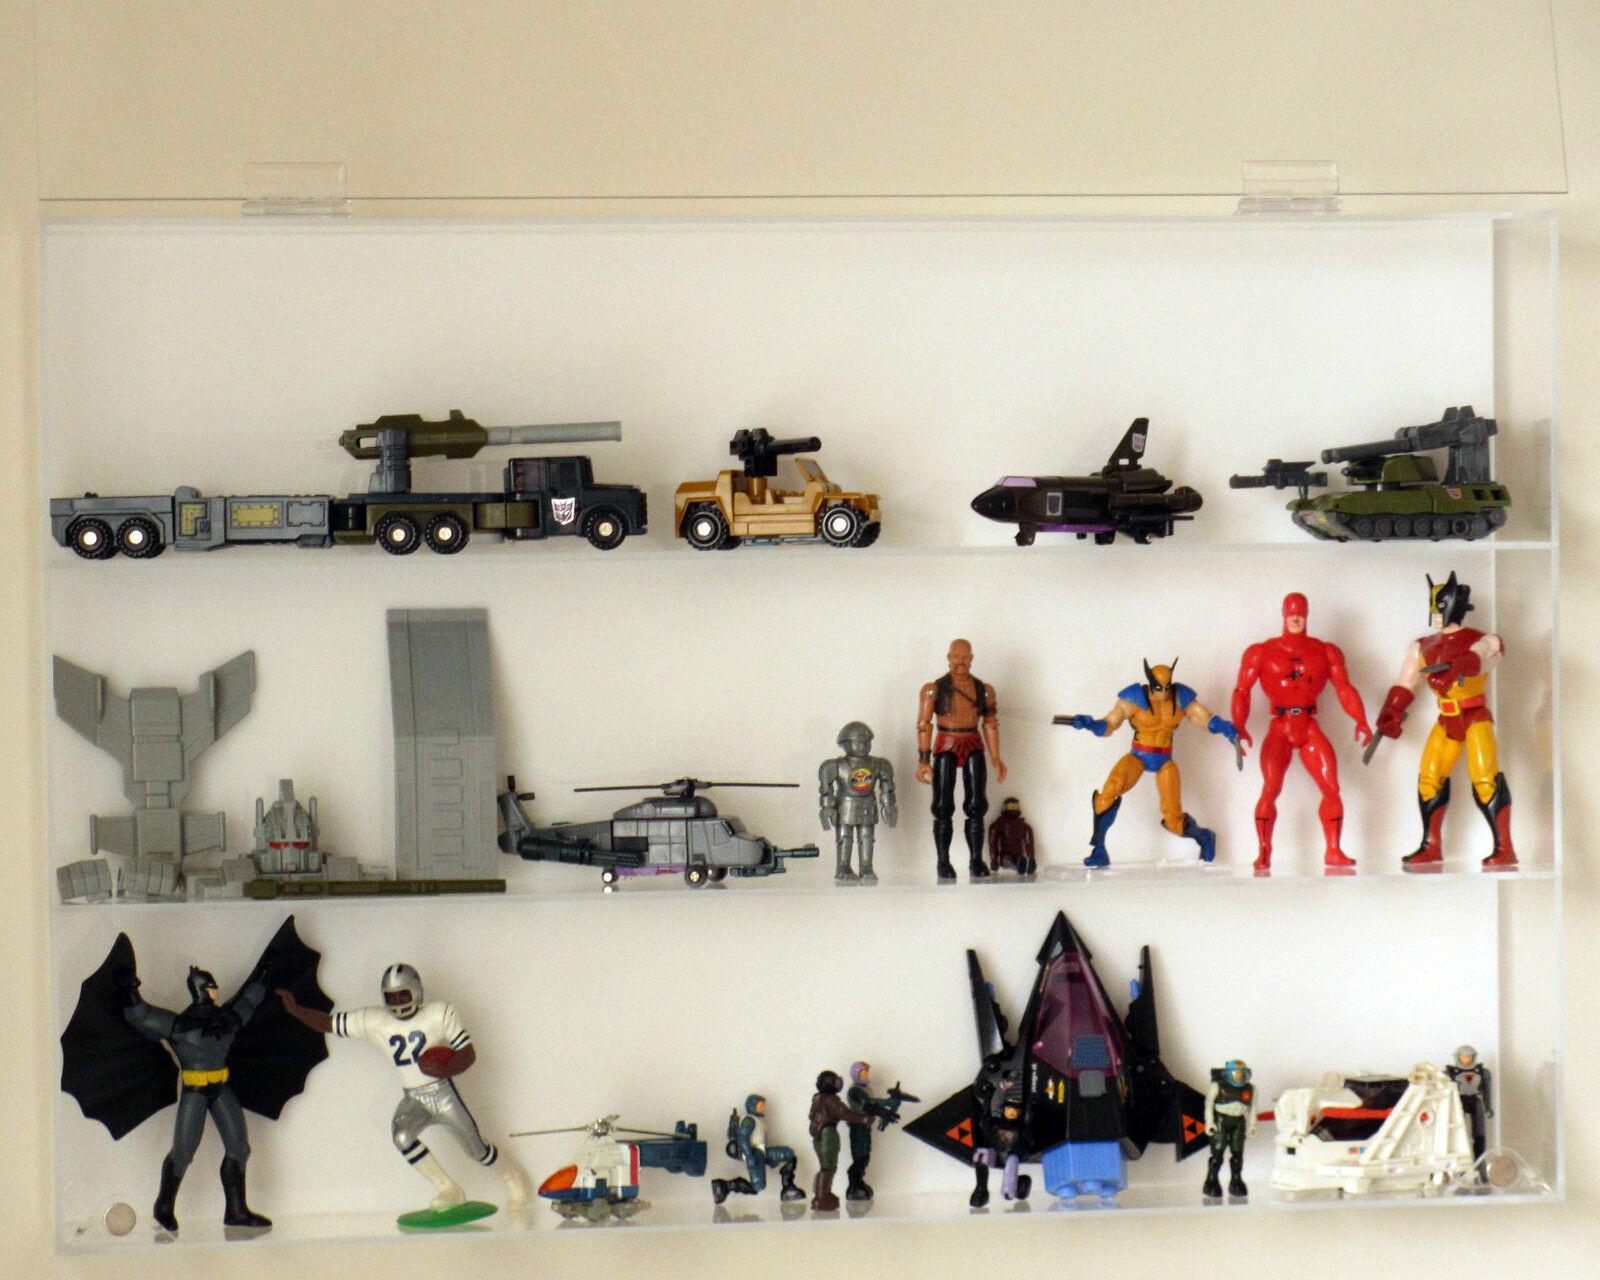 Collectors Showcase - Premium Display Case for Action Figures - S2MS